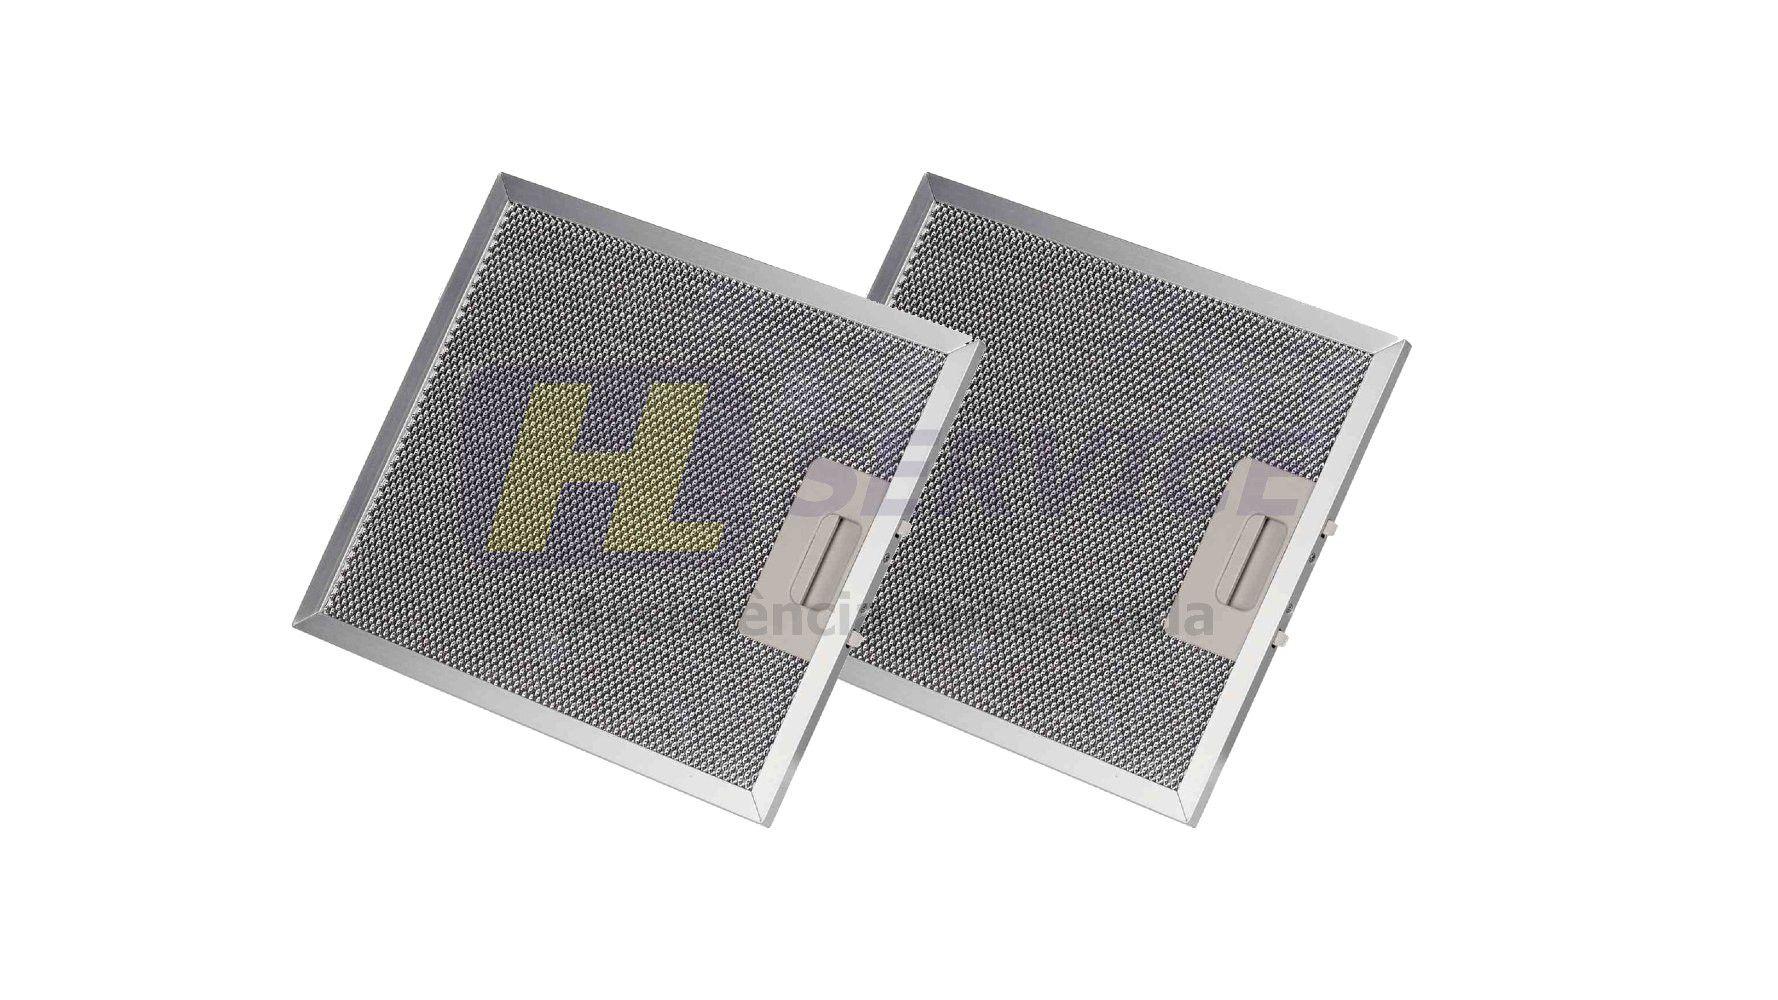 Kit Filtro Tela Depurador SLIM SUGGAR 27,8 x 31,6 cm 02 un